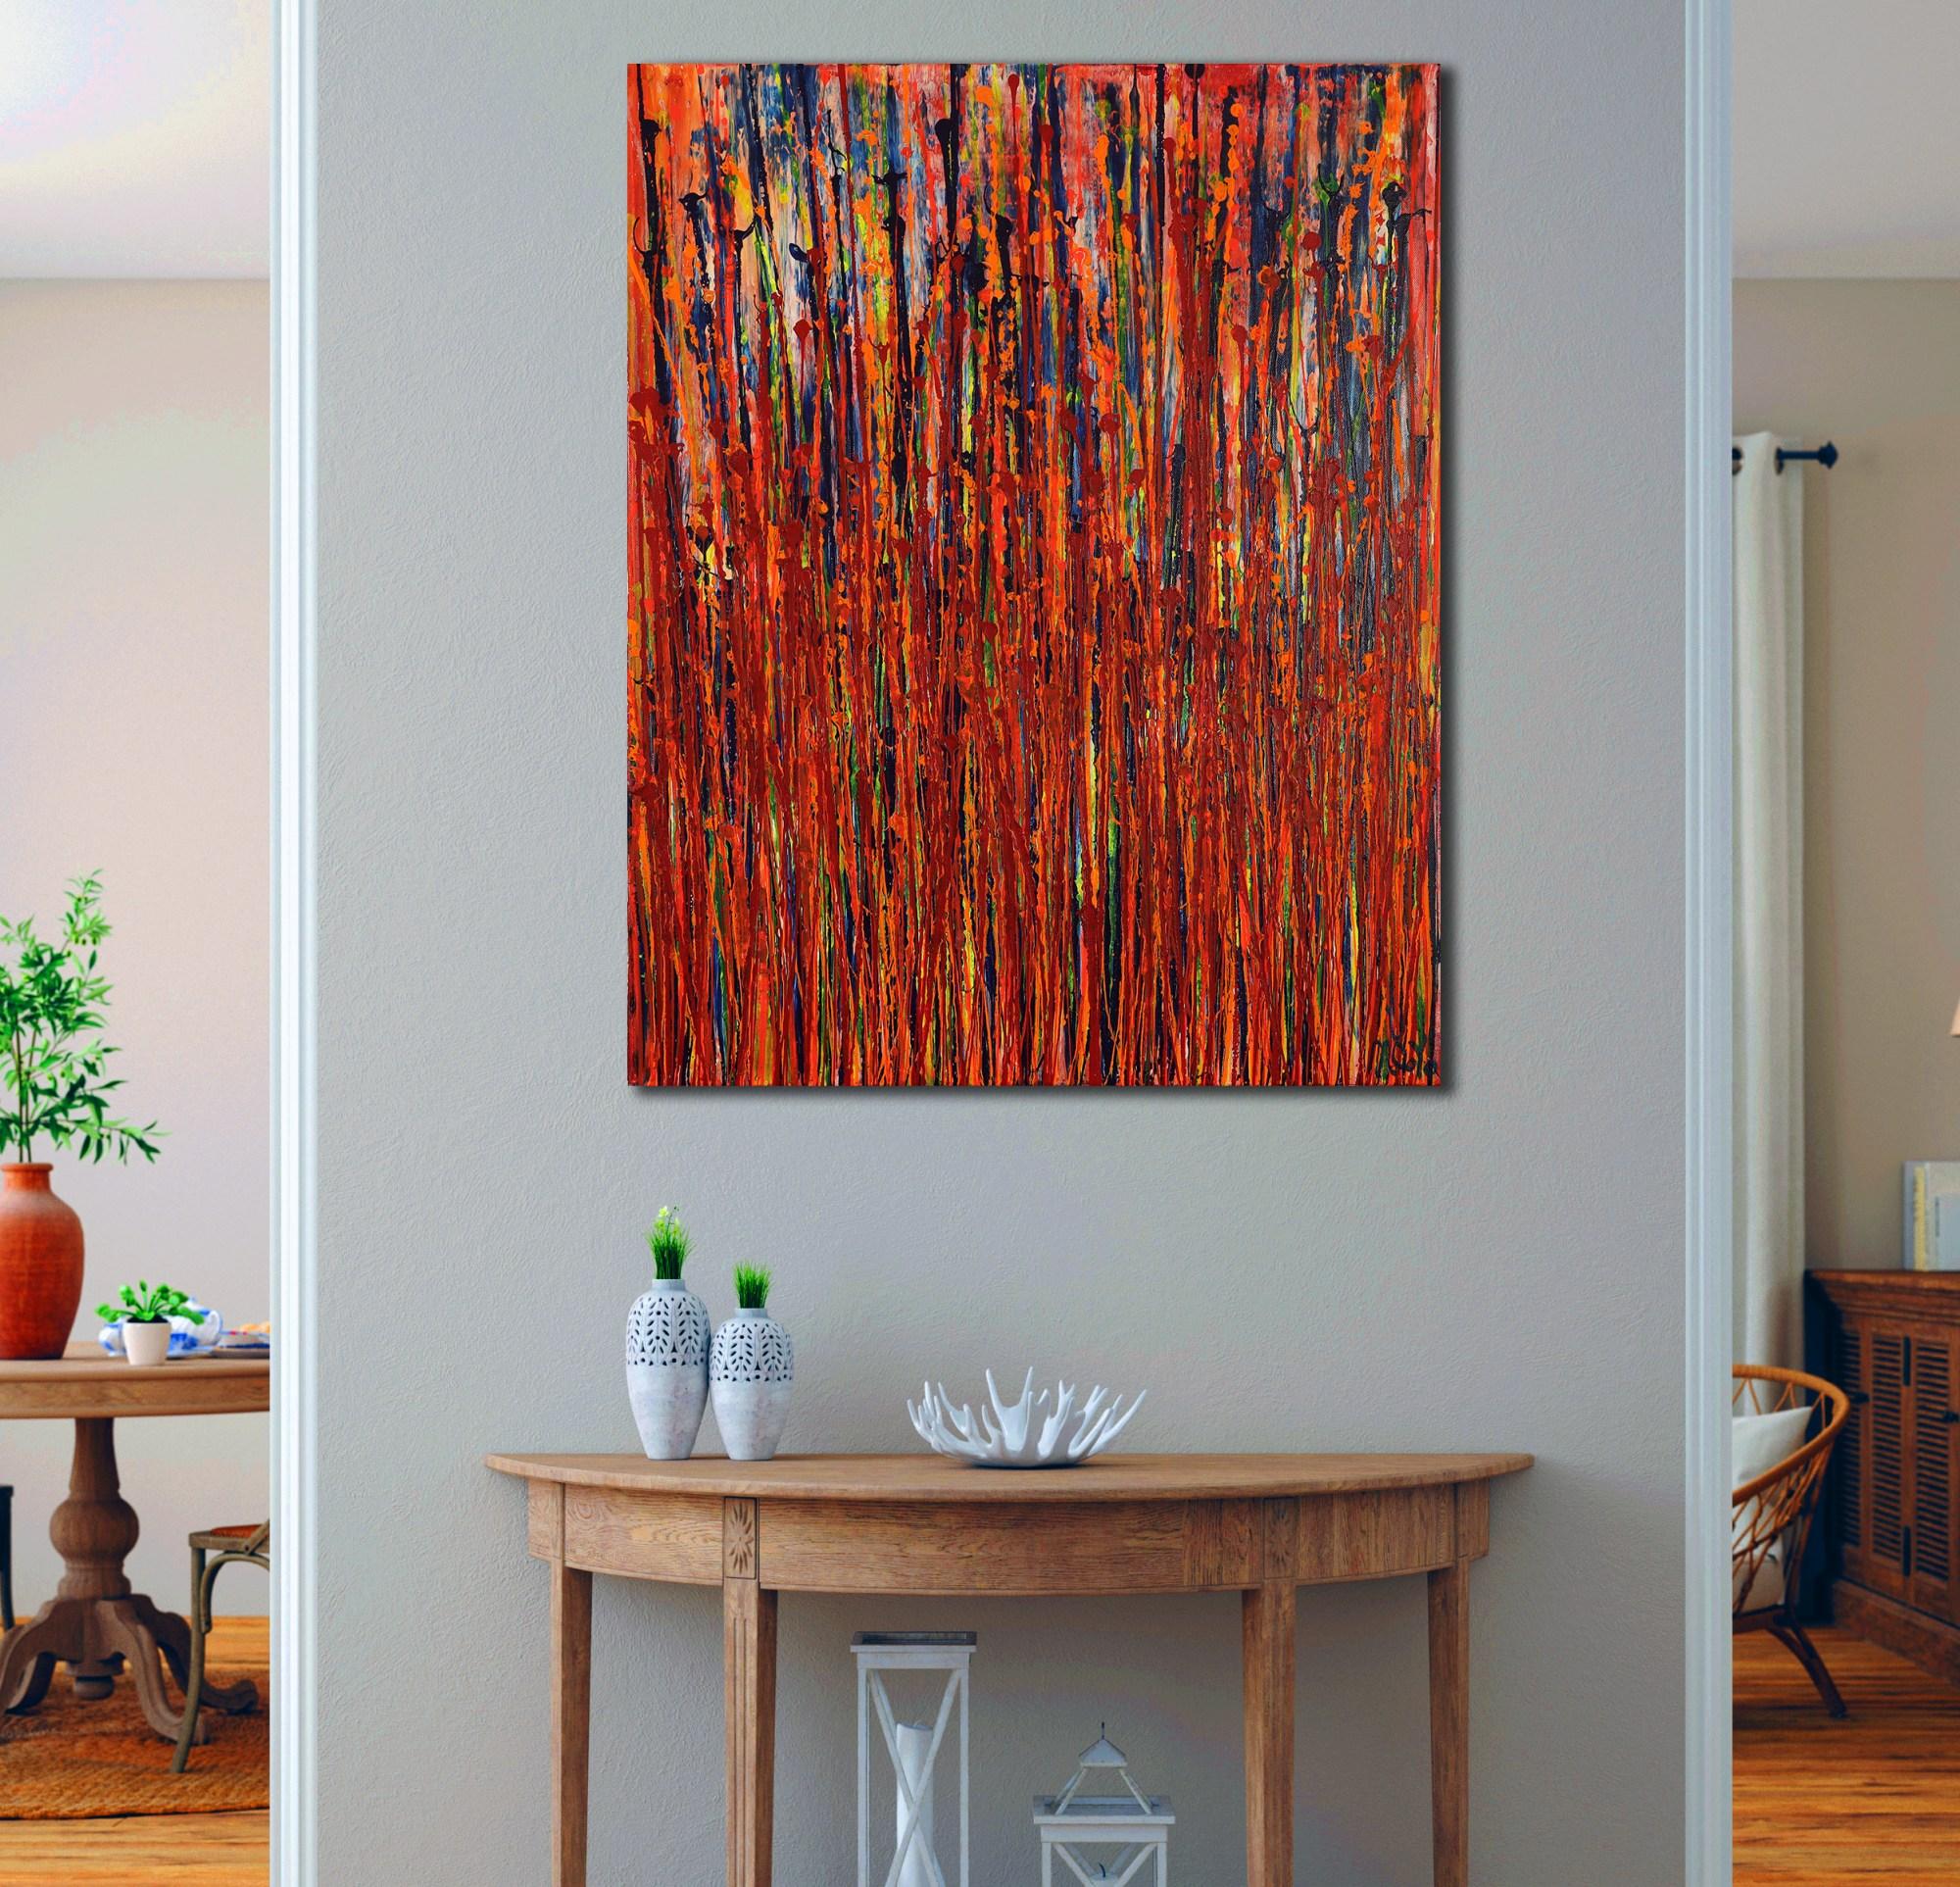 Room example / Panorama Astratto 1 (2021) 24X30 Inches / Artist: Nestor Toro